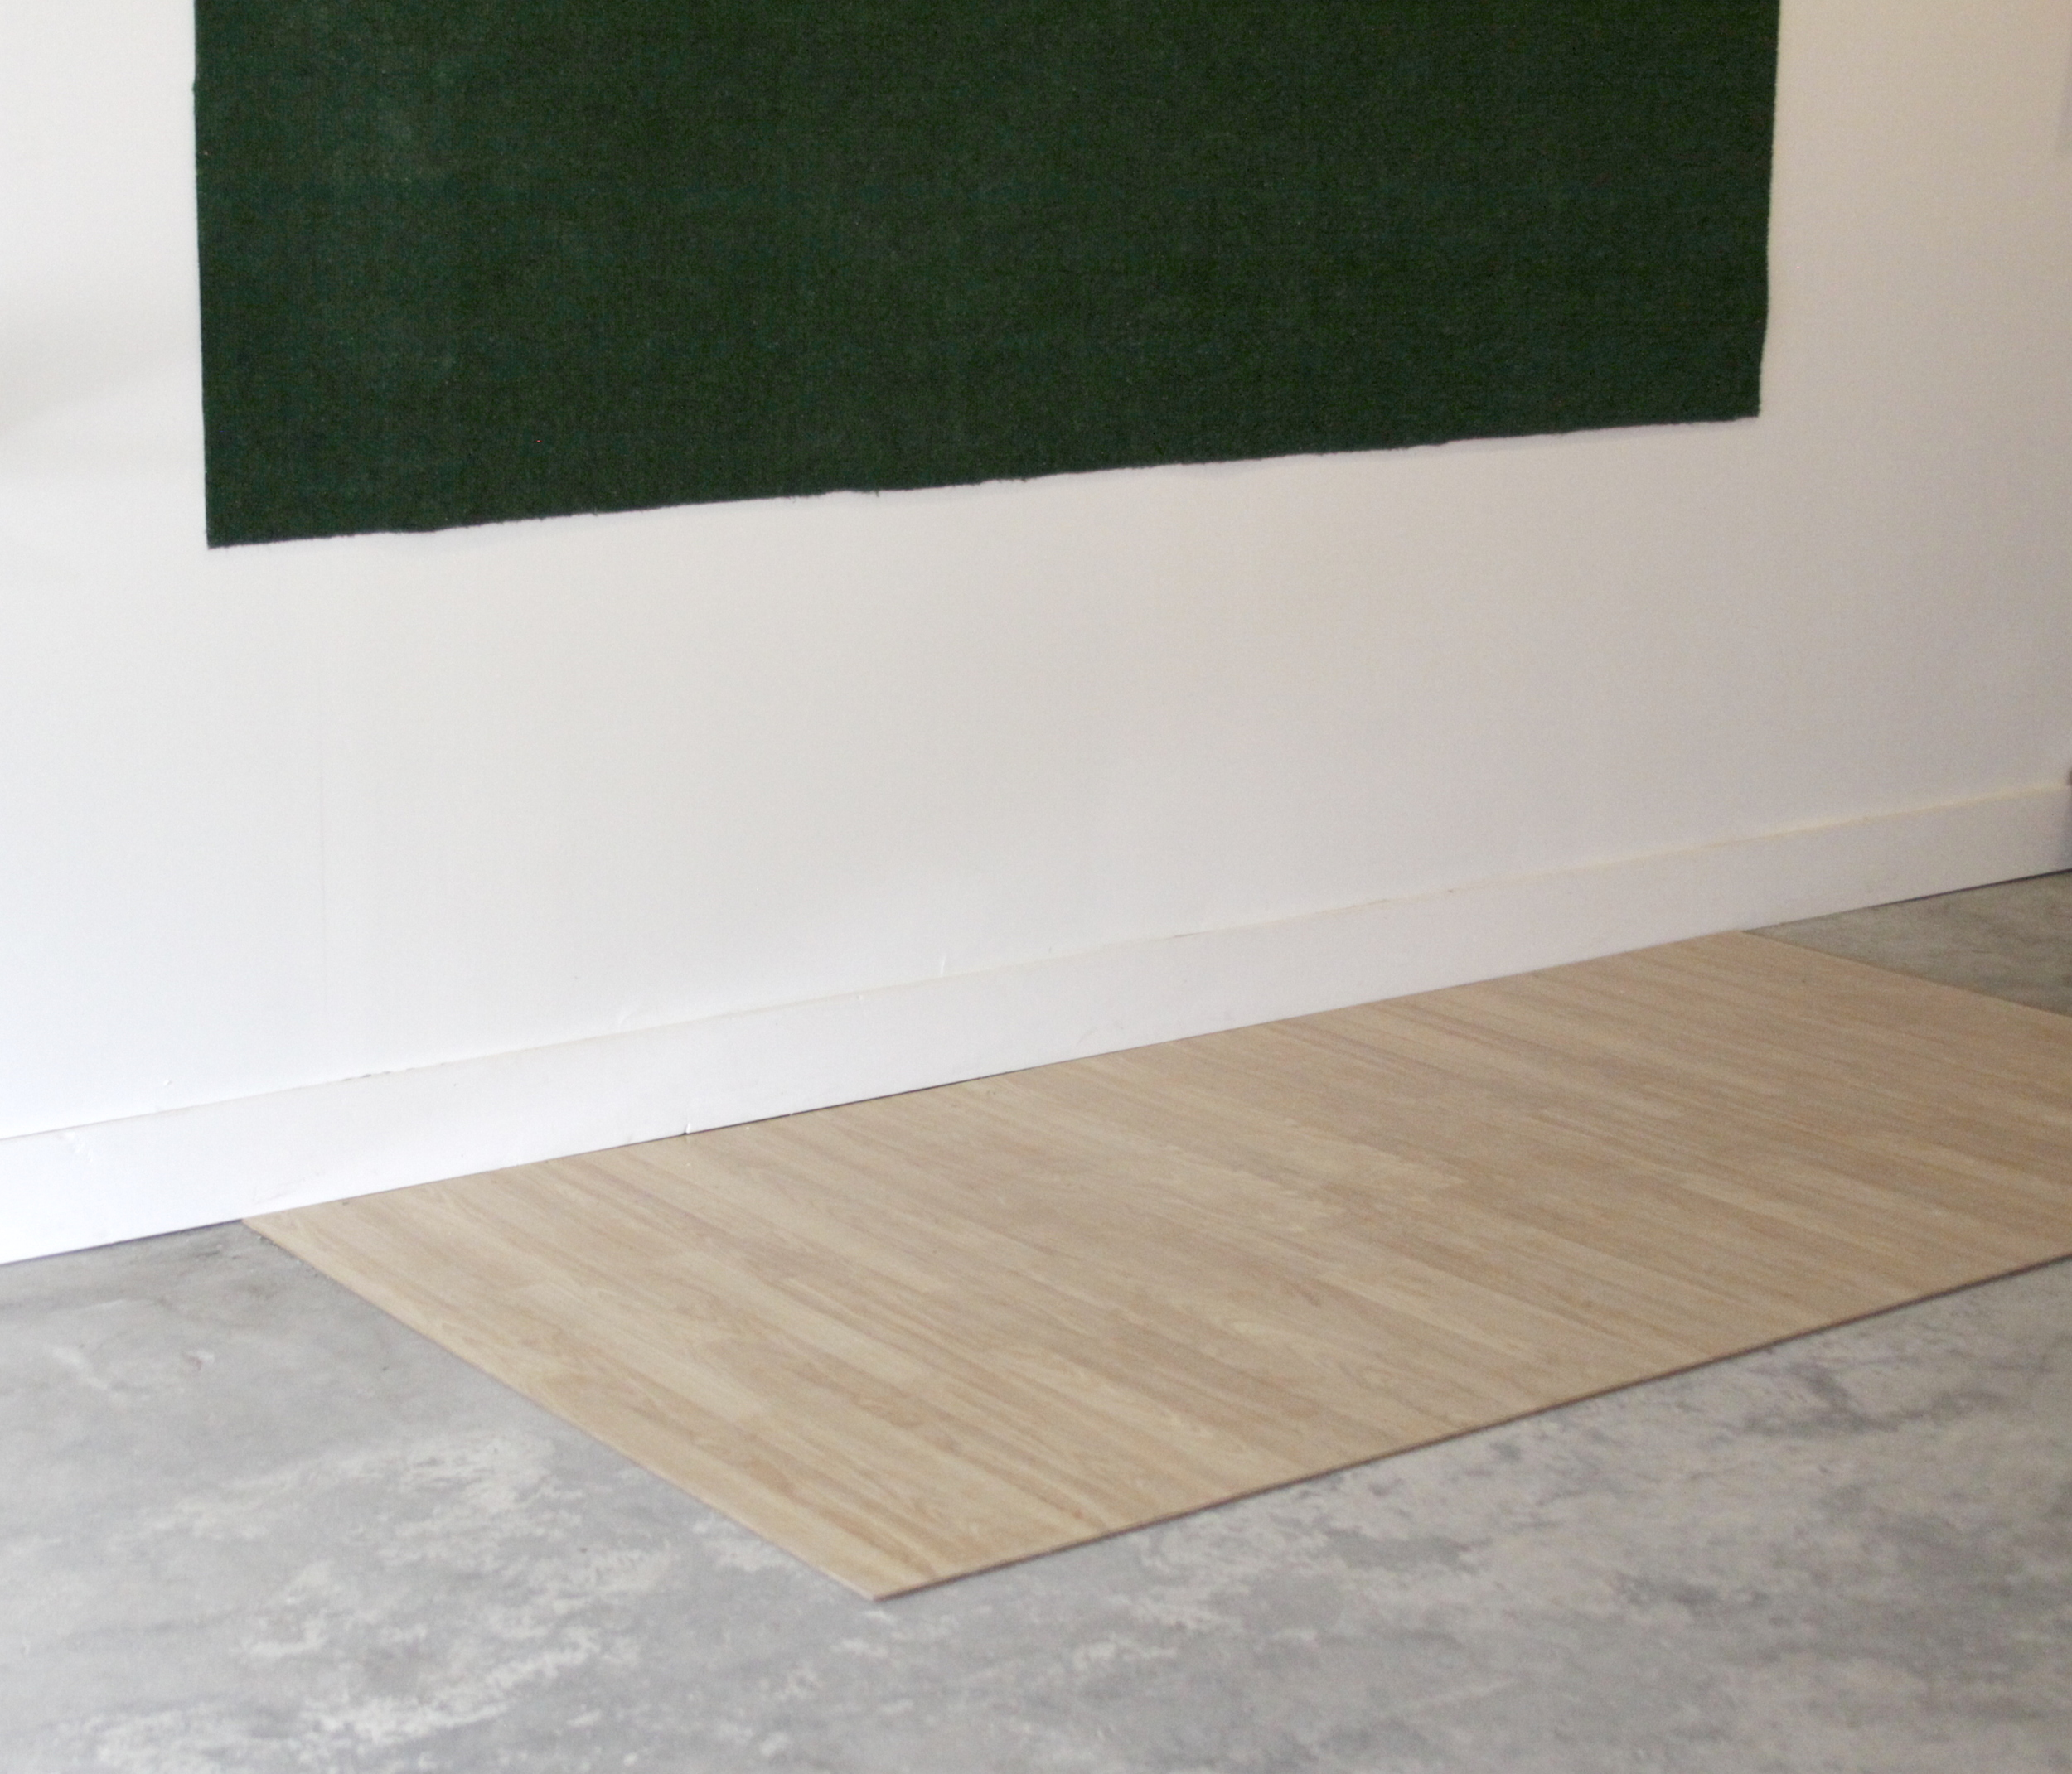 "Active Recreational Space  AstroTurf, laminate flooring, polyurethane turf: 120"" x 54"" laminate: 120"" x 54"" 2015"